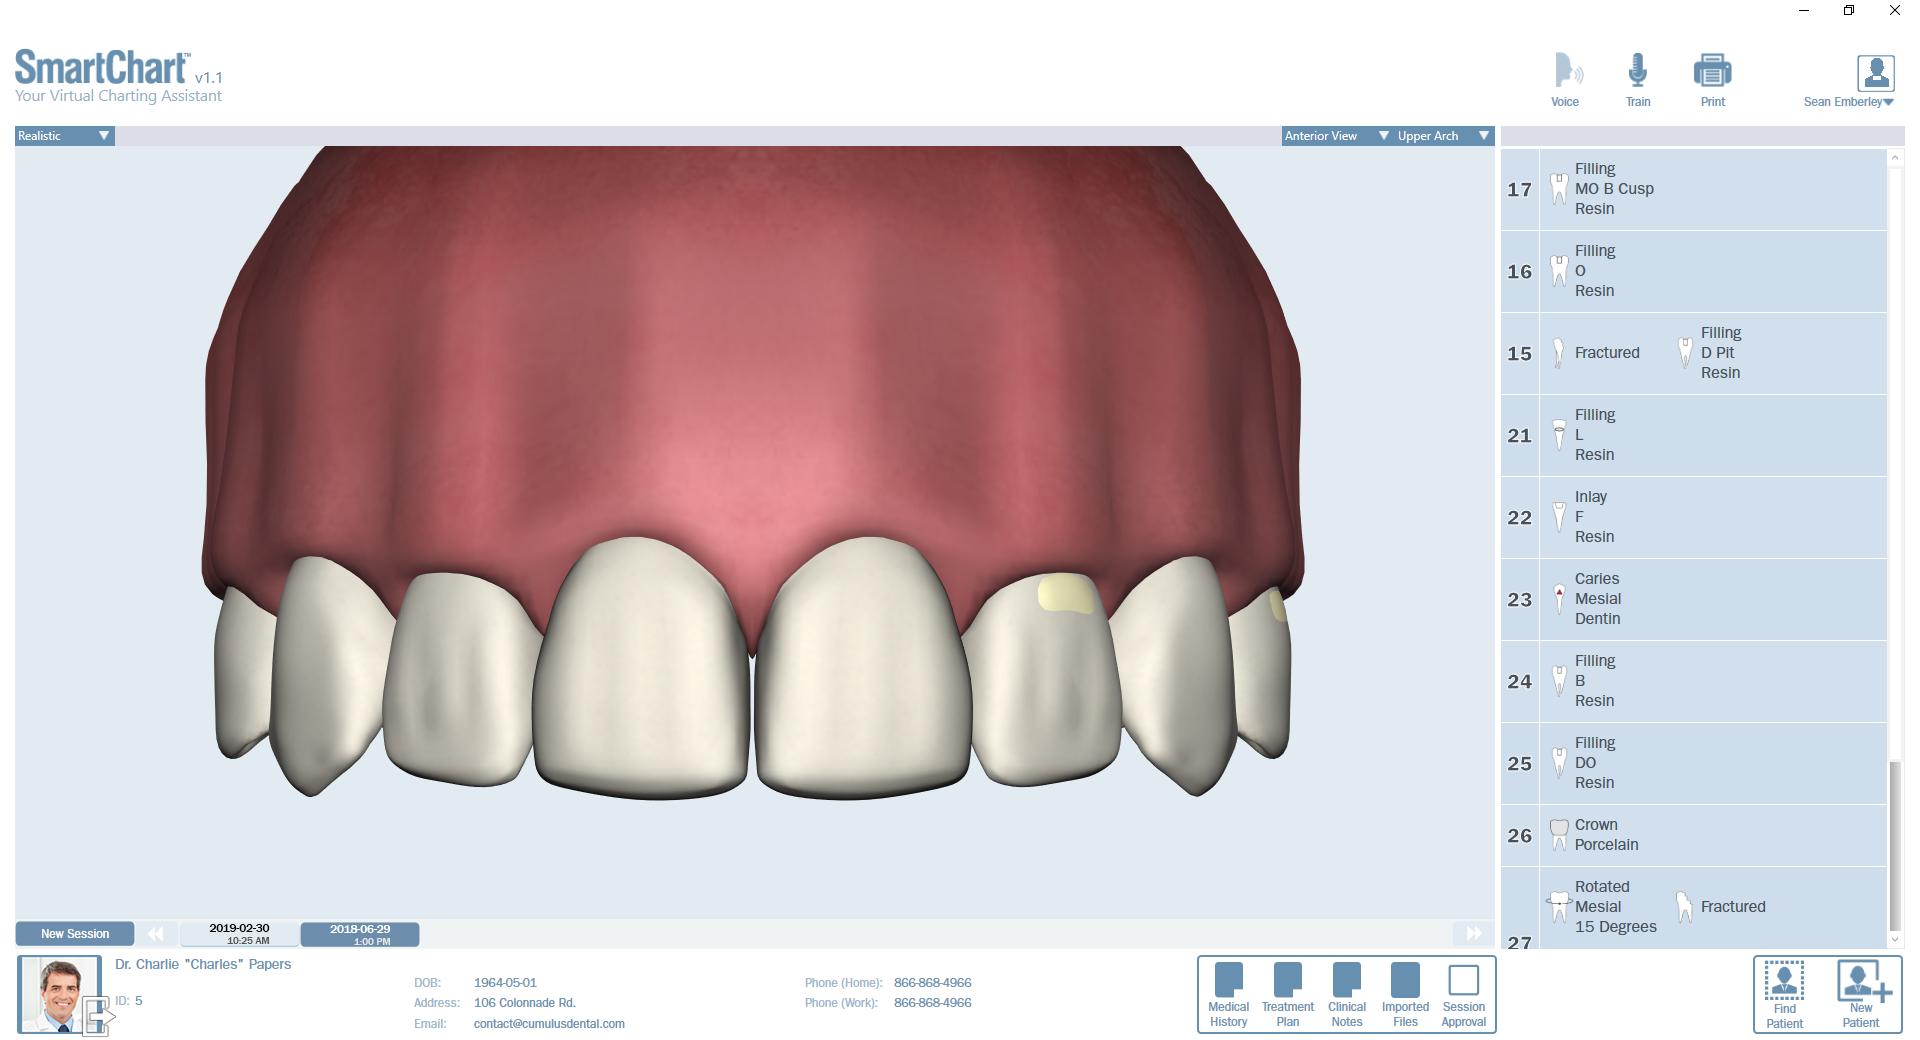 Patient2-Odontogram-Upper-Anterior.png